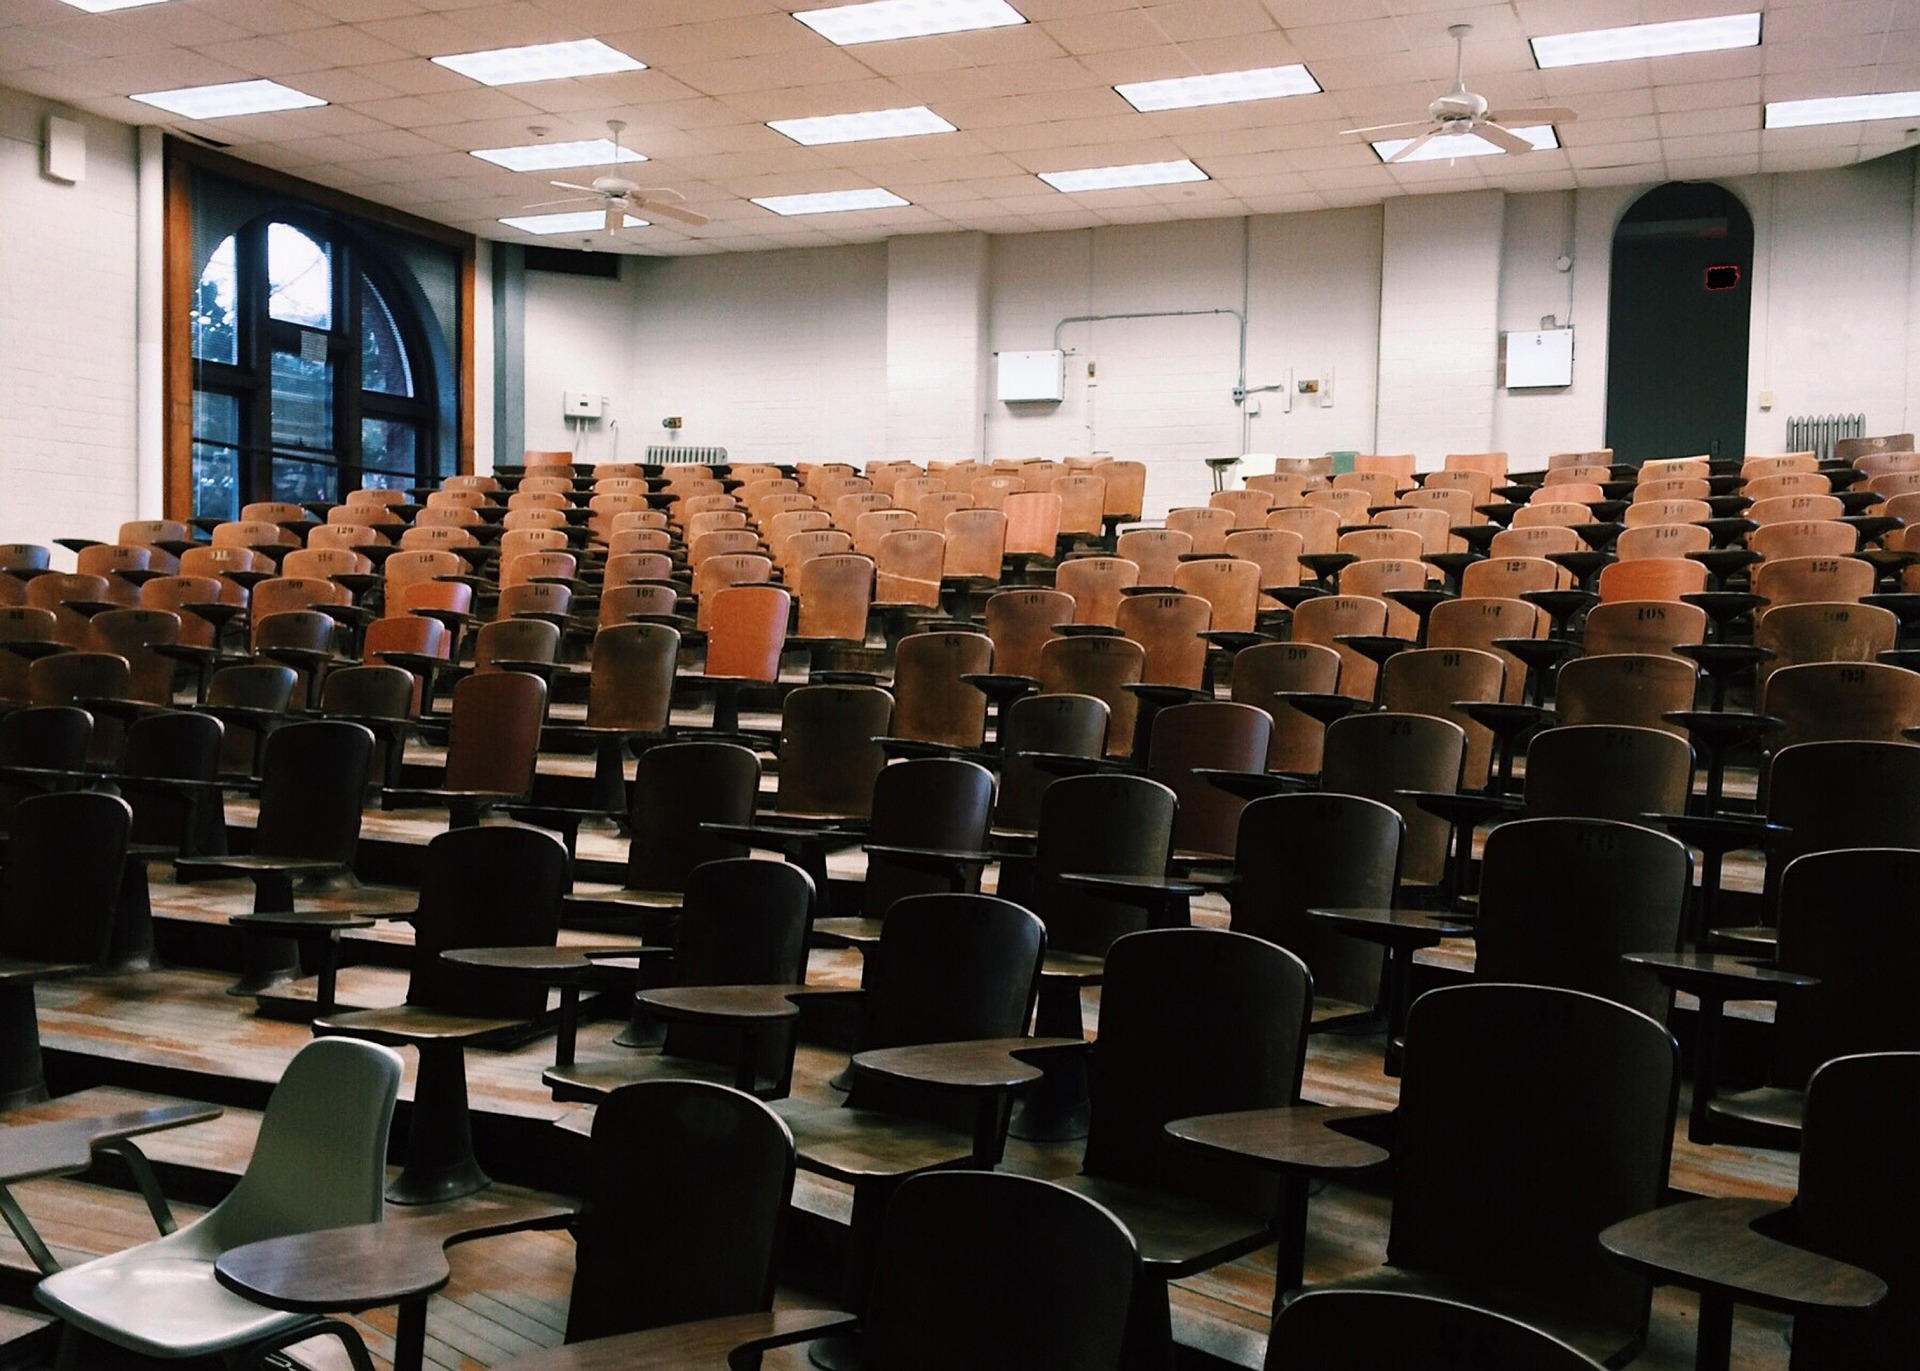 classroom-2093745_1920